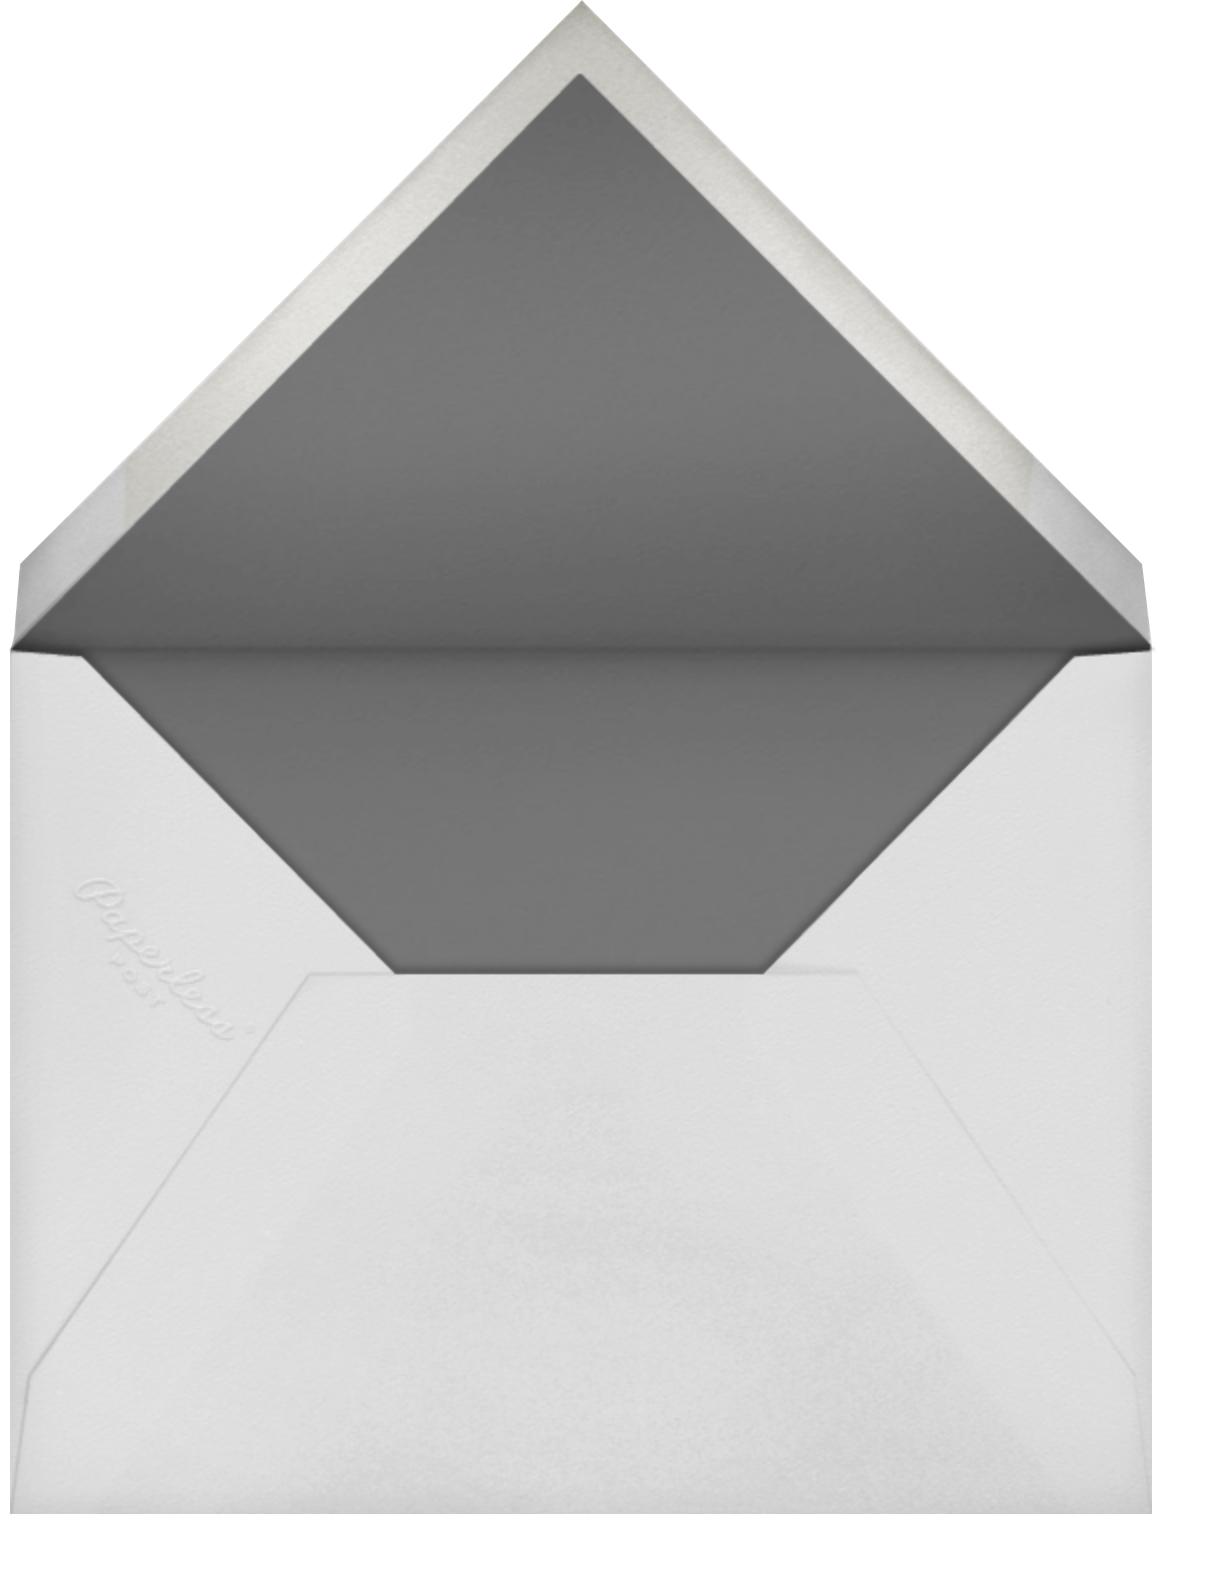 Custom (Tall) - Paperless Post - Cameo - envelope back